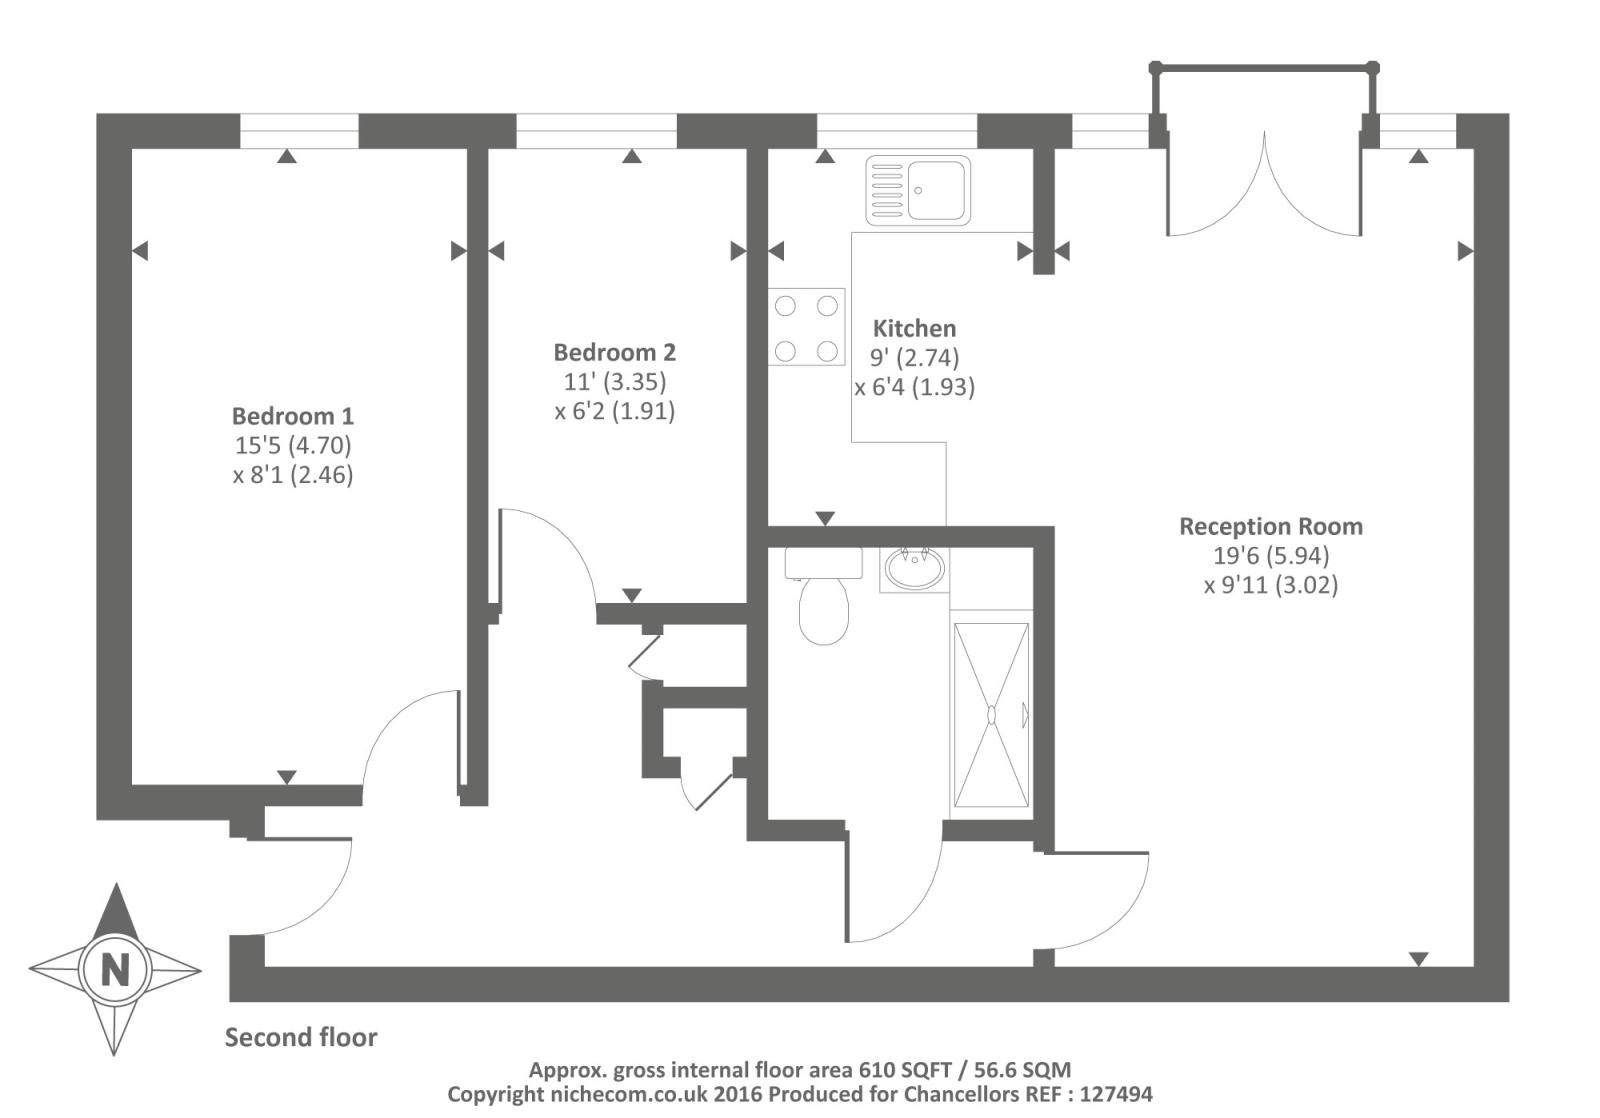 Little field sandy lane west oxford ox4 2 bedroom flat for 16 brookers lane floor plans